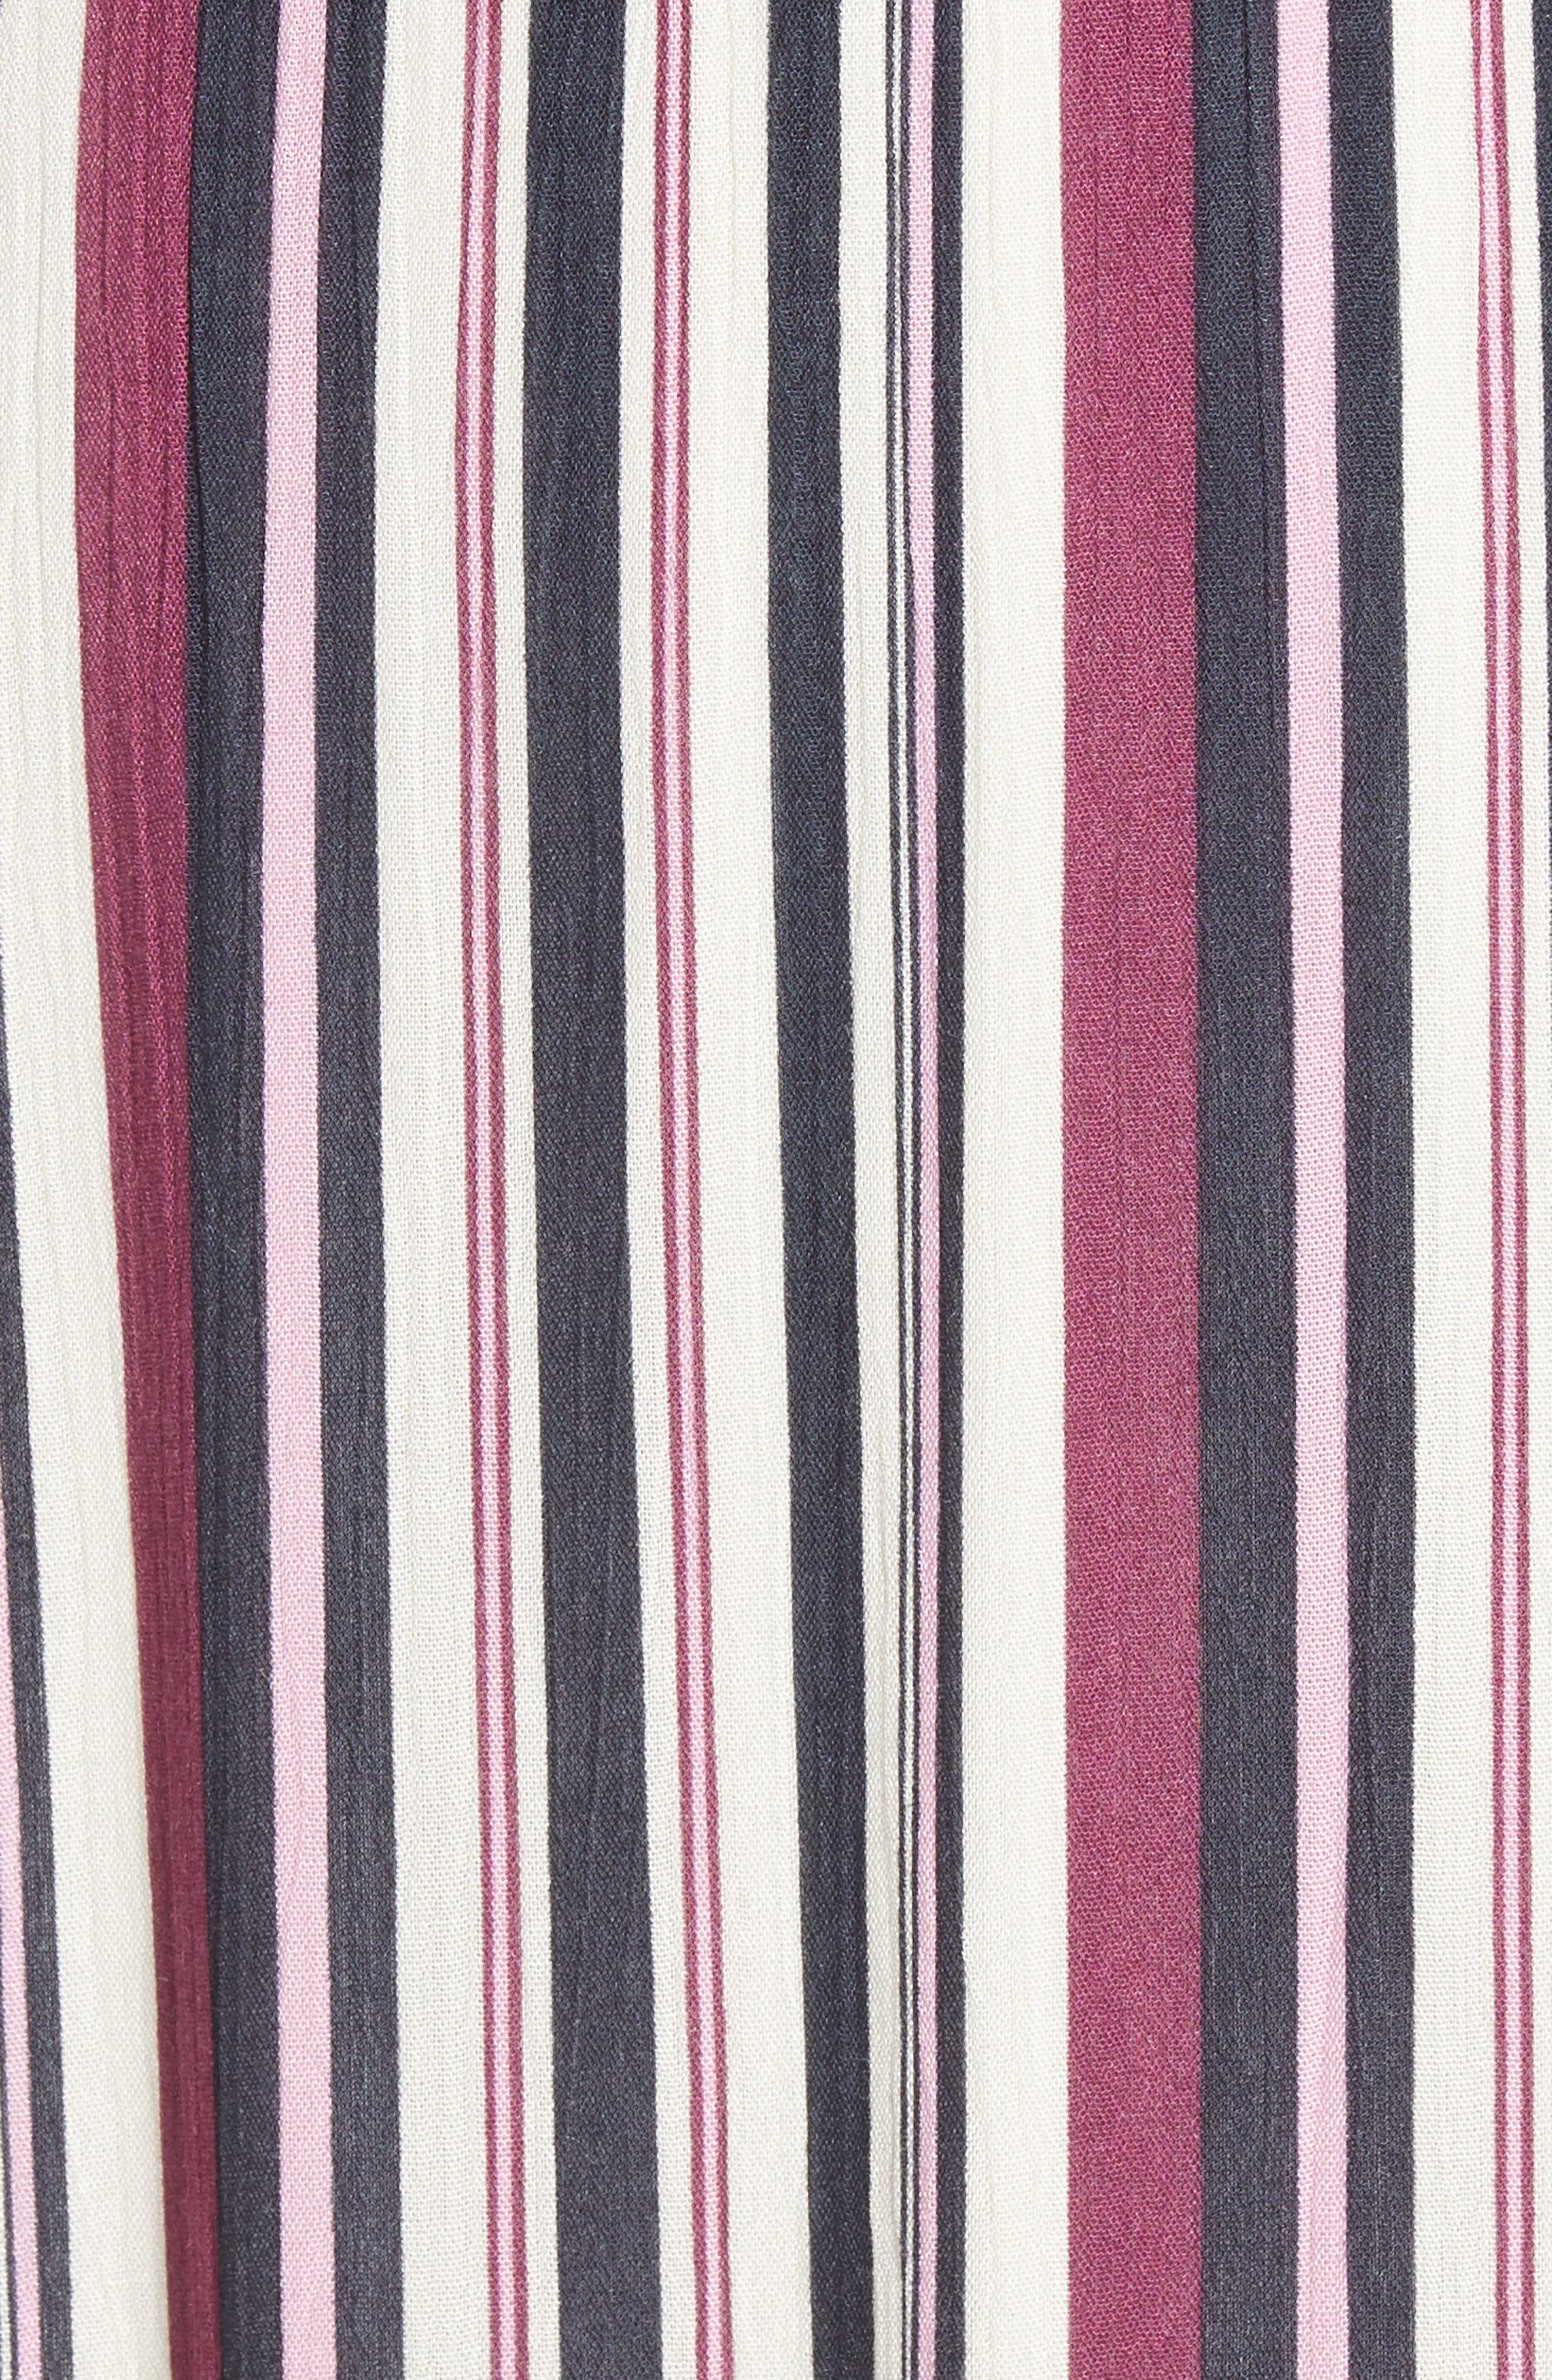 Tie Sleeve Maxi Dress,                             Alternate thumbnail 6, color,                             MULTI STRIPE